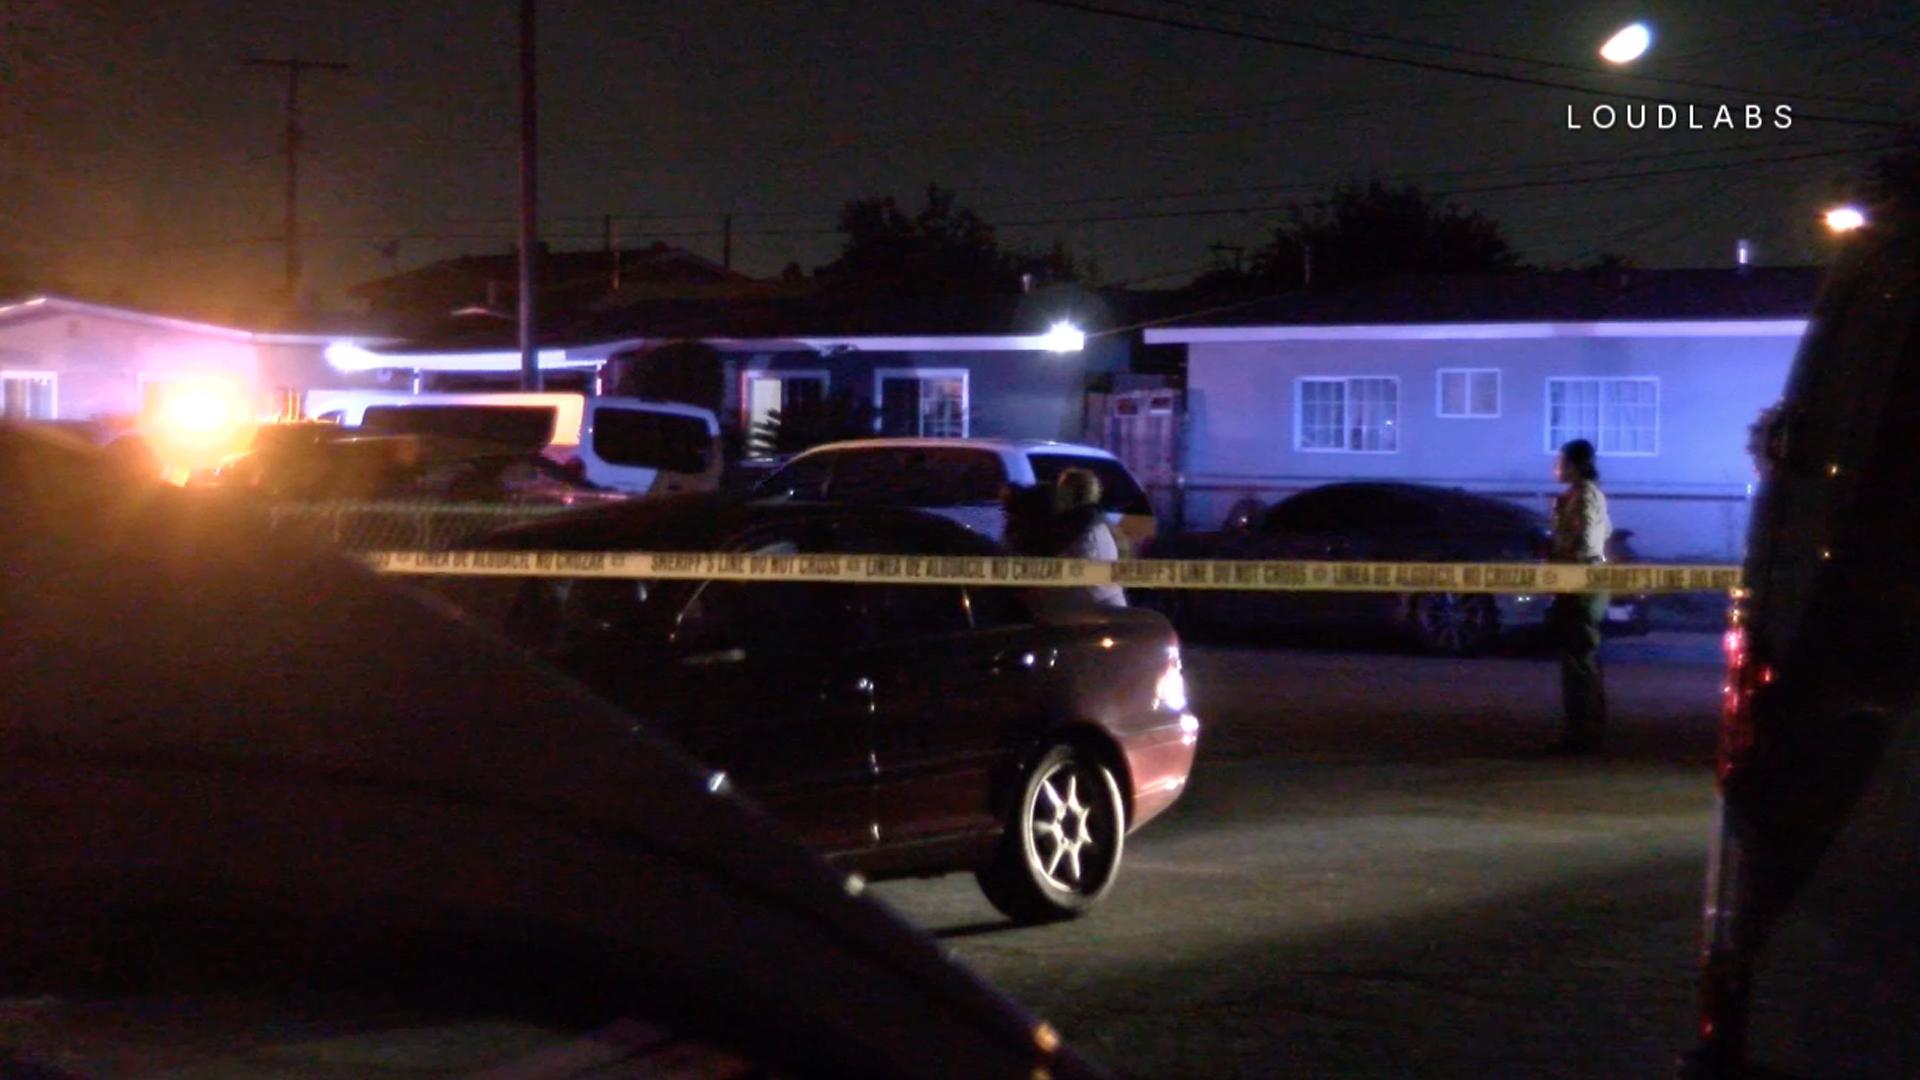 Deputies investigate a shooting that left two men dead in Norwalk on Sept. 6, 2019. (Credit: LoudLabs)